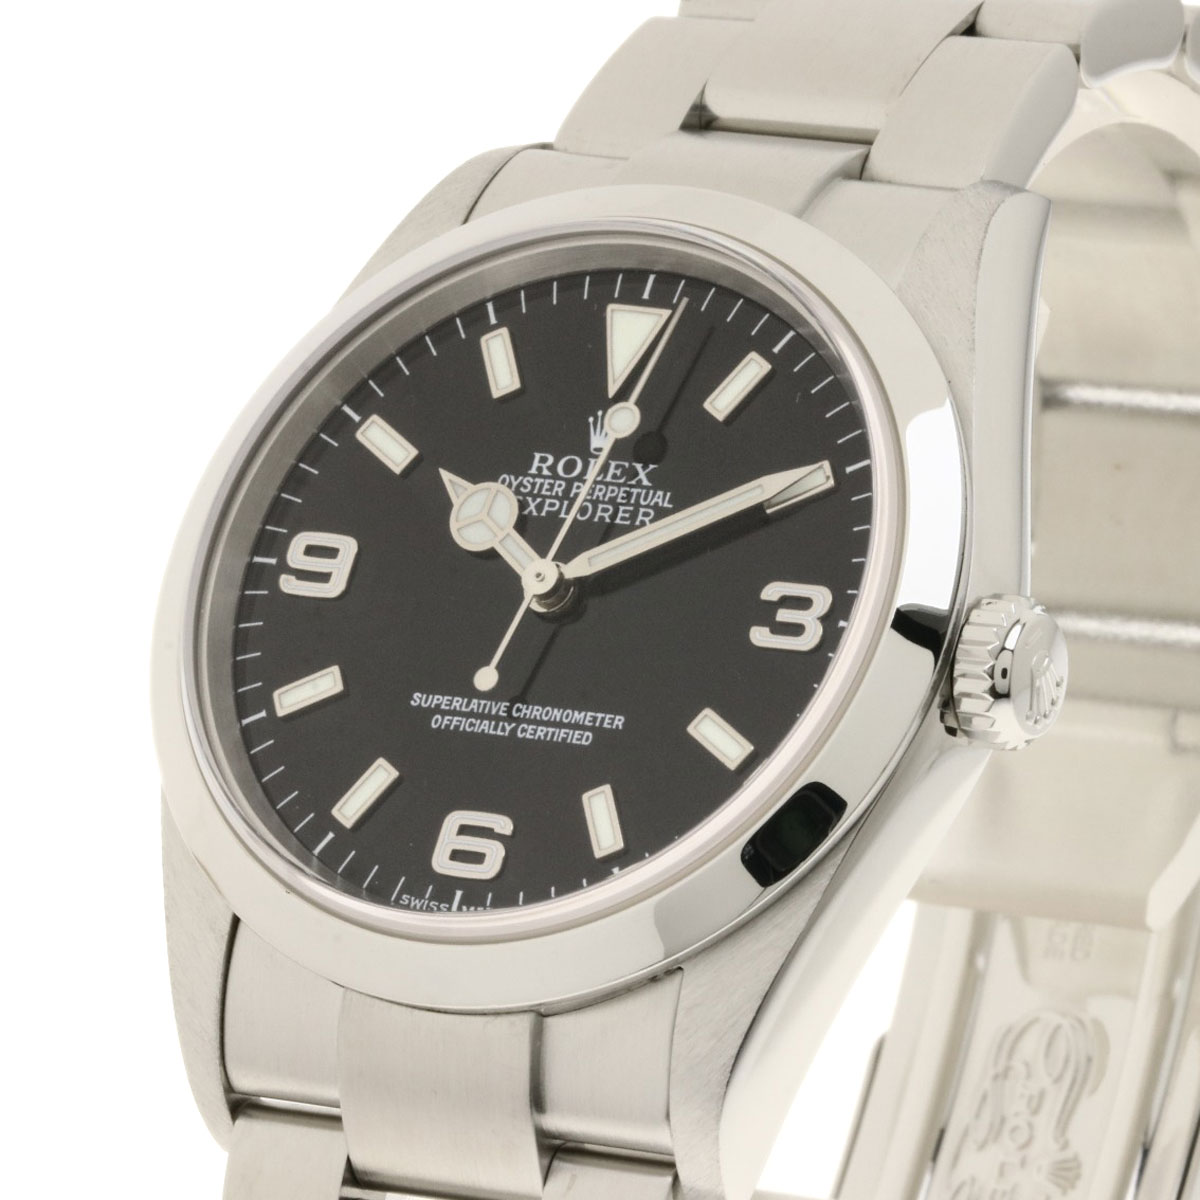 new product aac9d 76705 おしゃれ】 ロレックス 114270 エクスプローラー 腕時計 ...